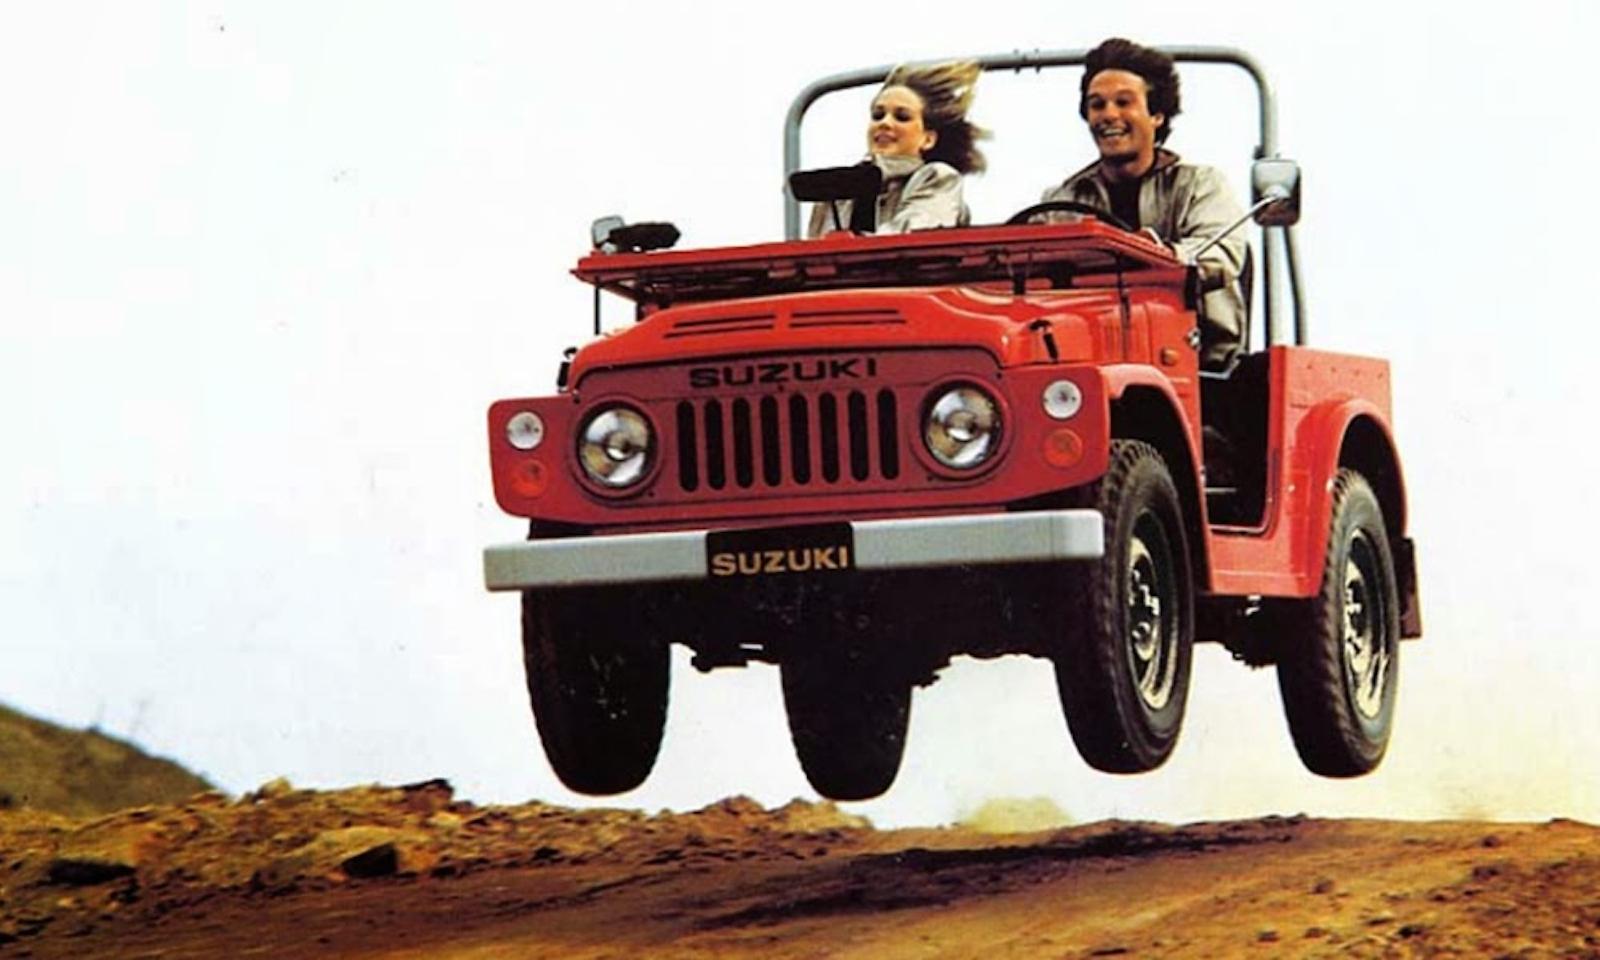 Suzuki Jimny Japan Automotive Hall Of Fame 2